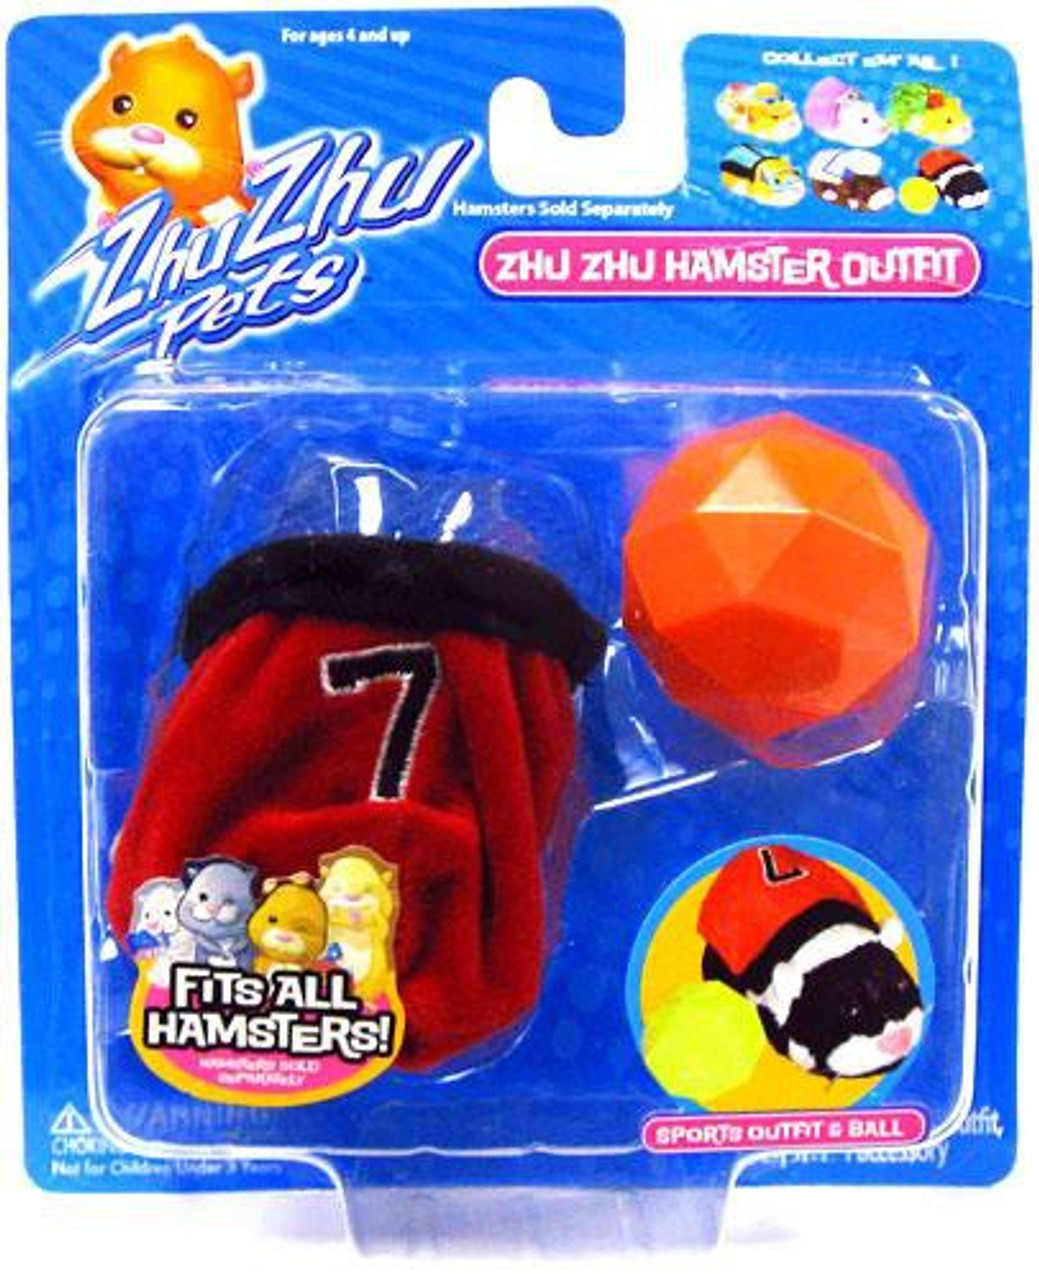 Zhu Zhu Pets Series1 Hamster Outfit Sports Outfit & Ball Accessory Set